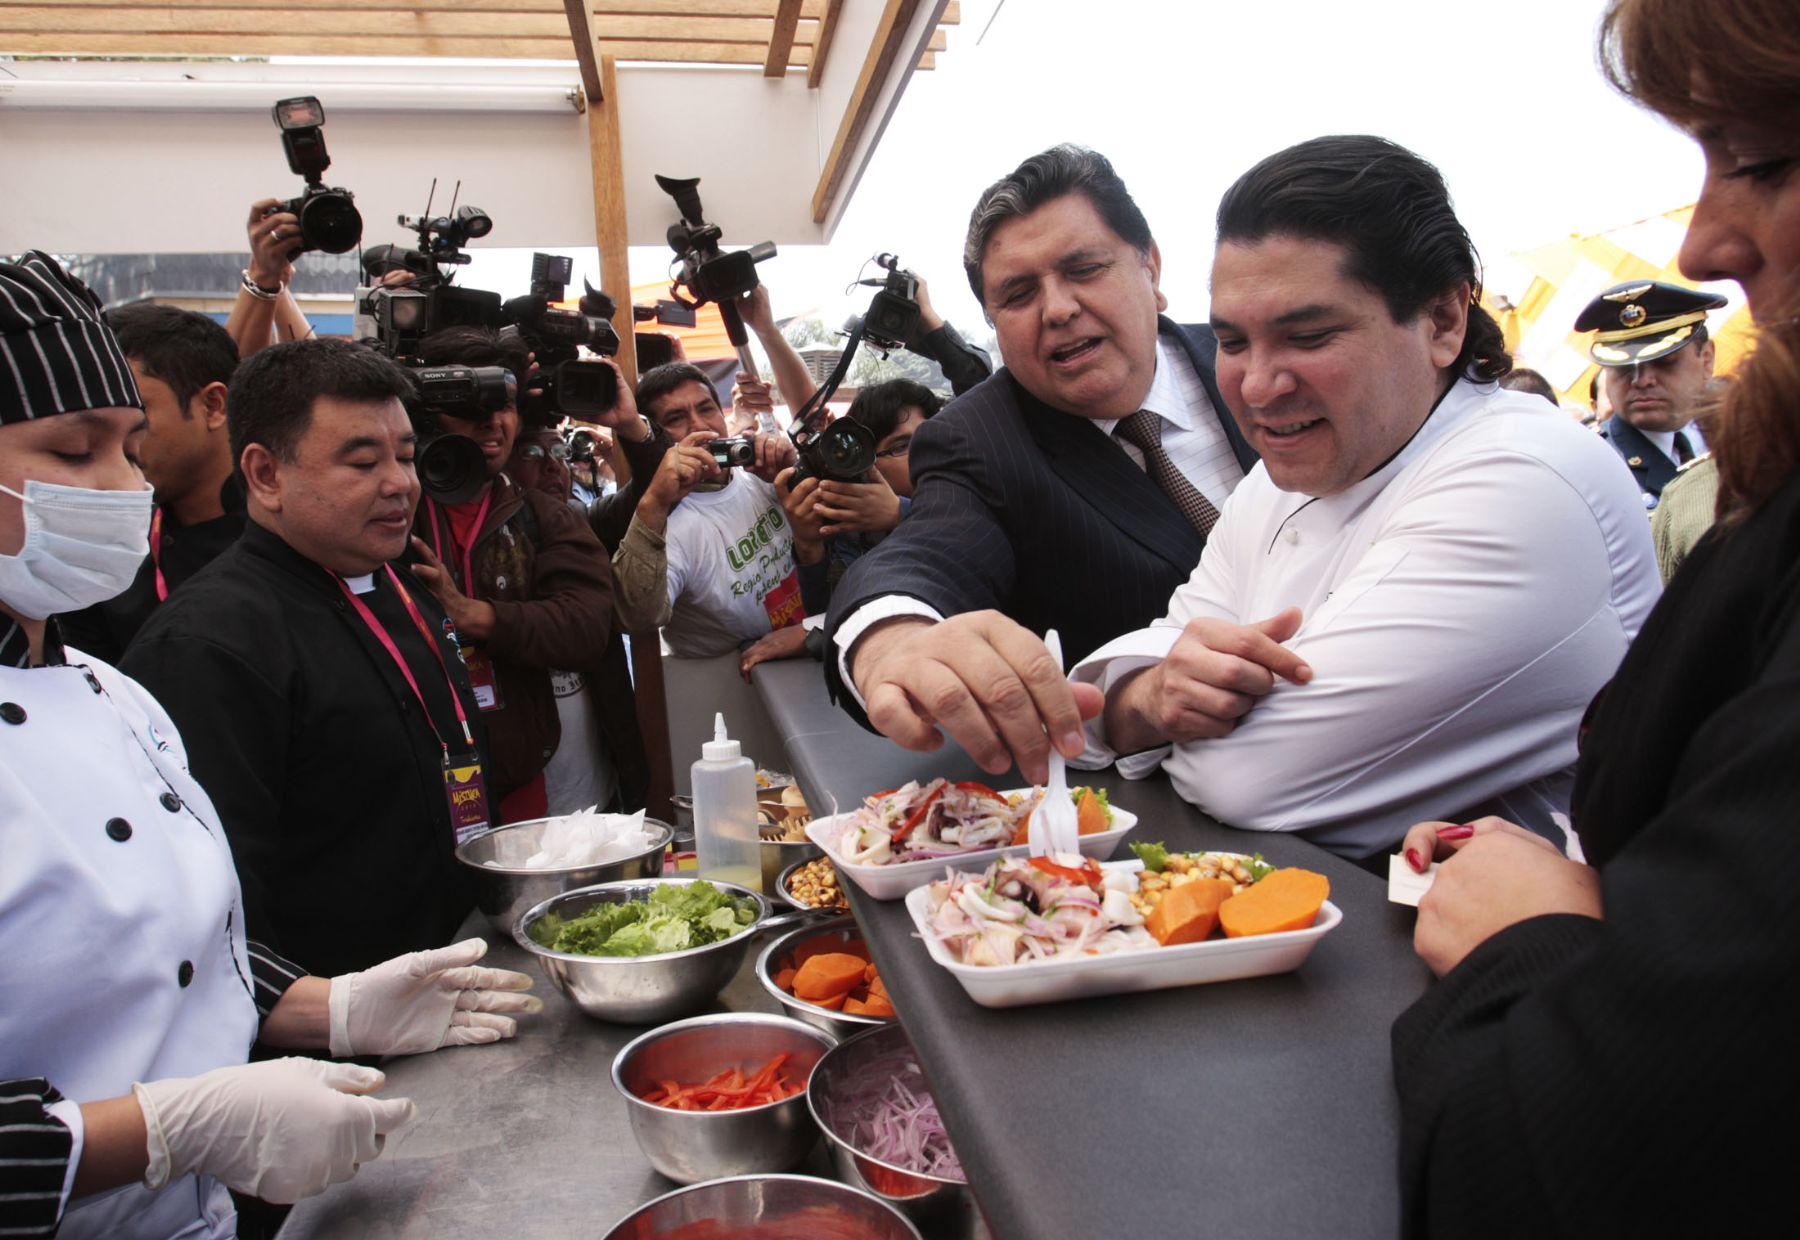 Comida peruana se cotiza hasta tres veces m s que la for Comida francesa en lima